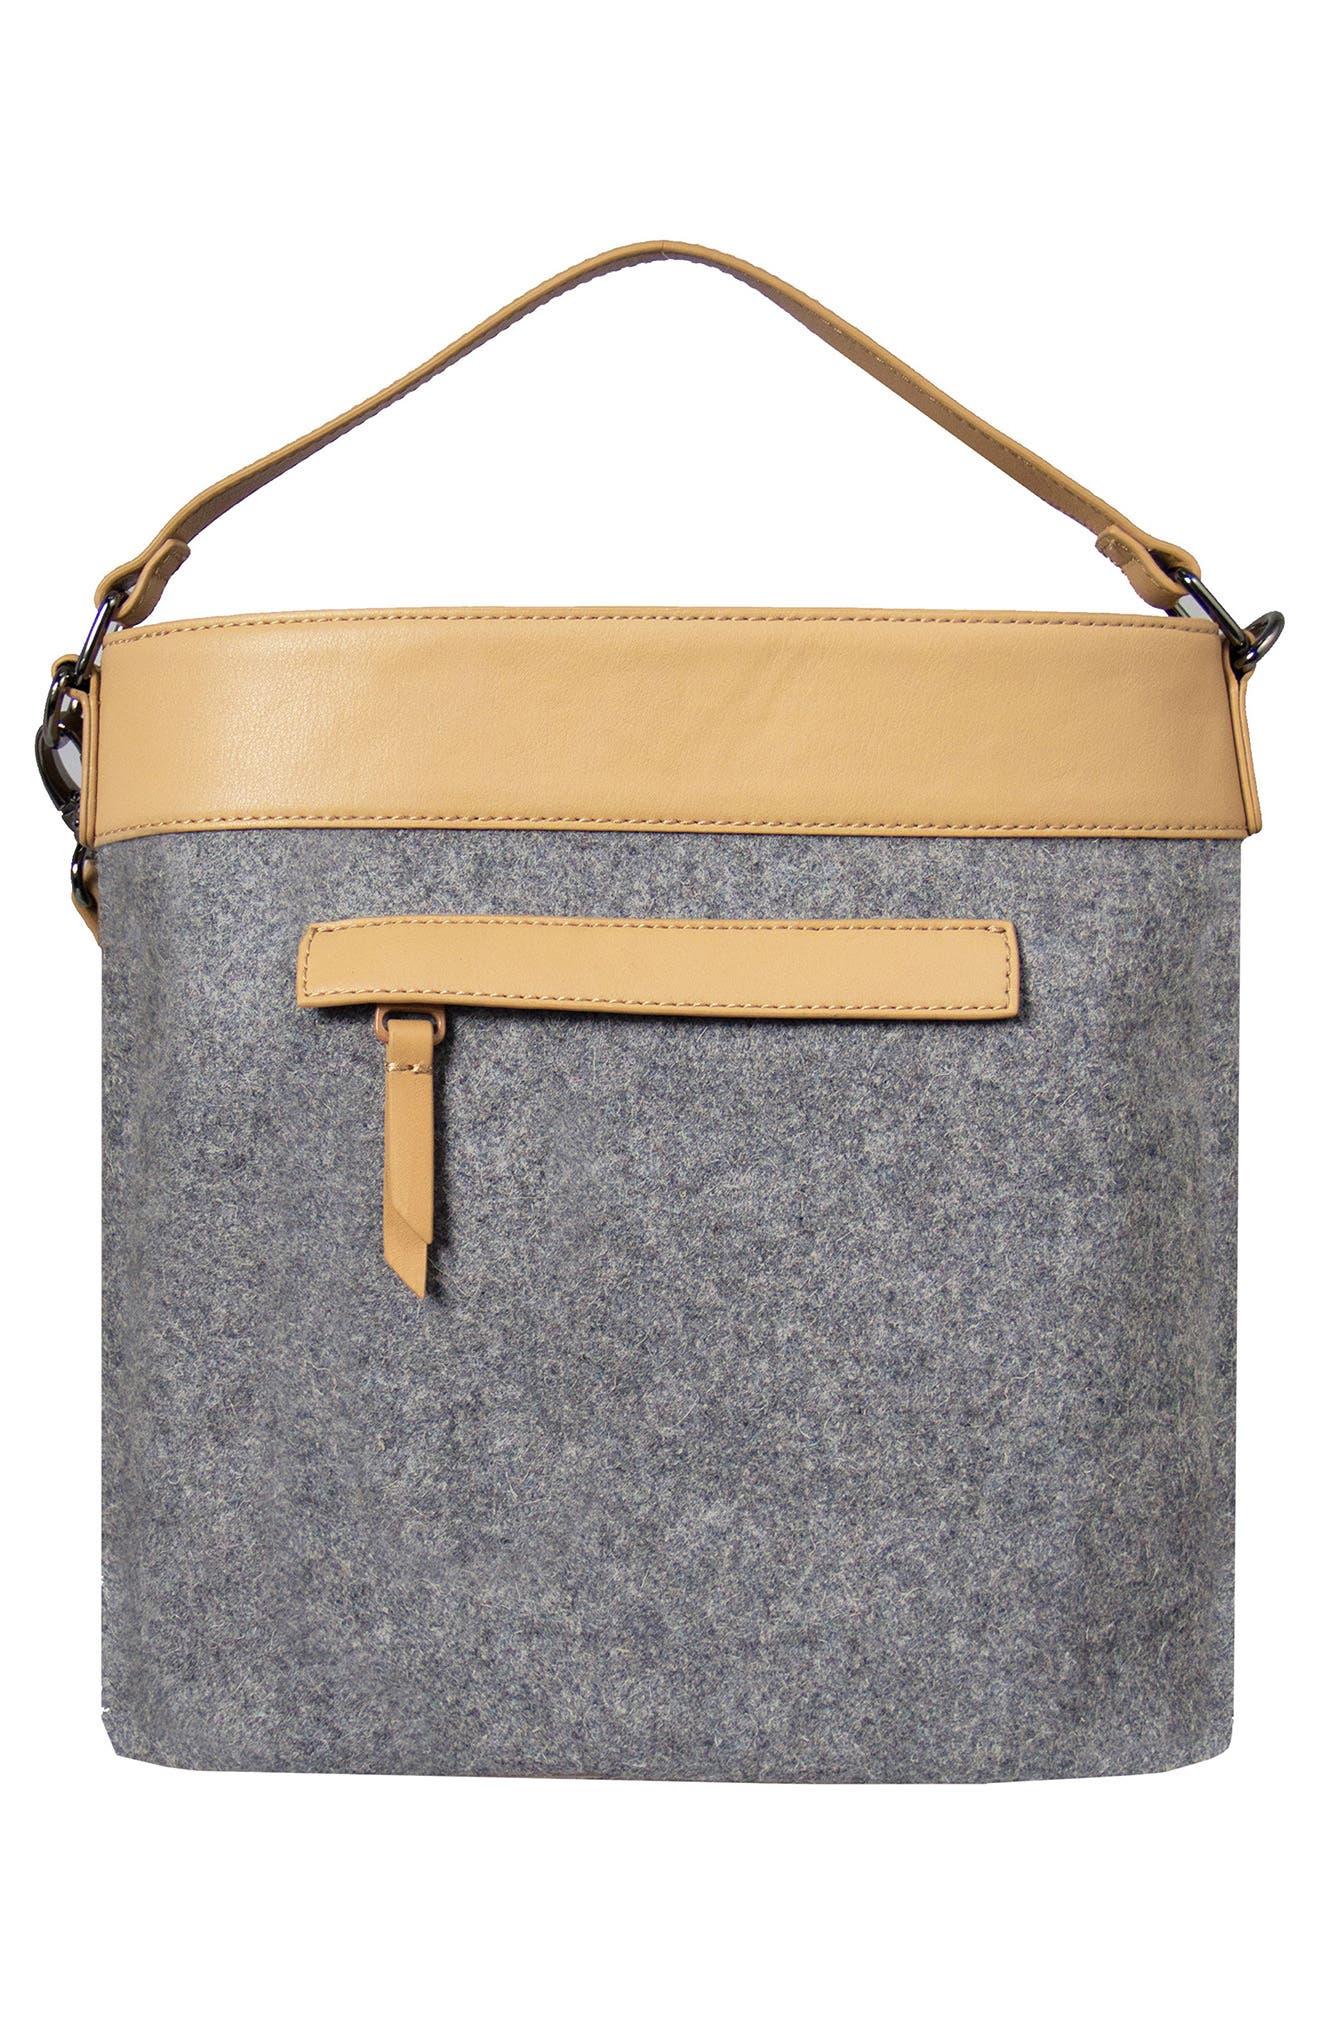 Boheme Wool & Leather Convertible Crossbody Bag,                             Alternate thumbnail 4, color,